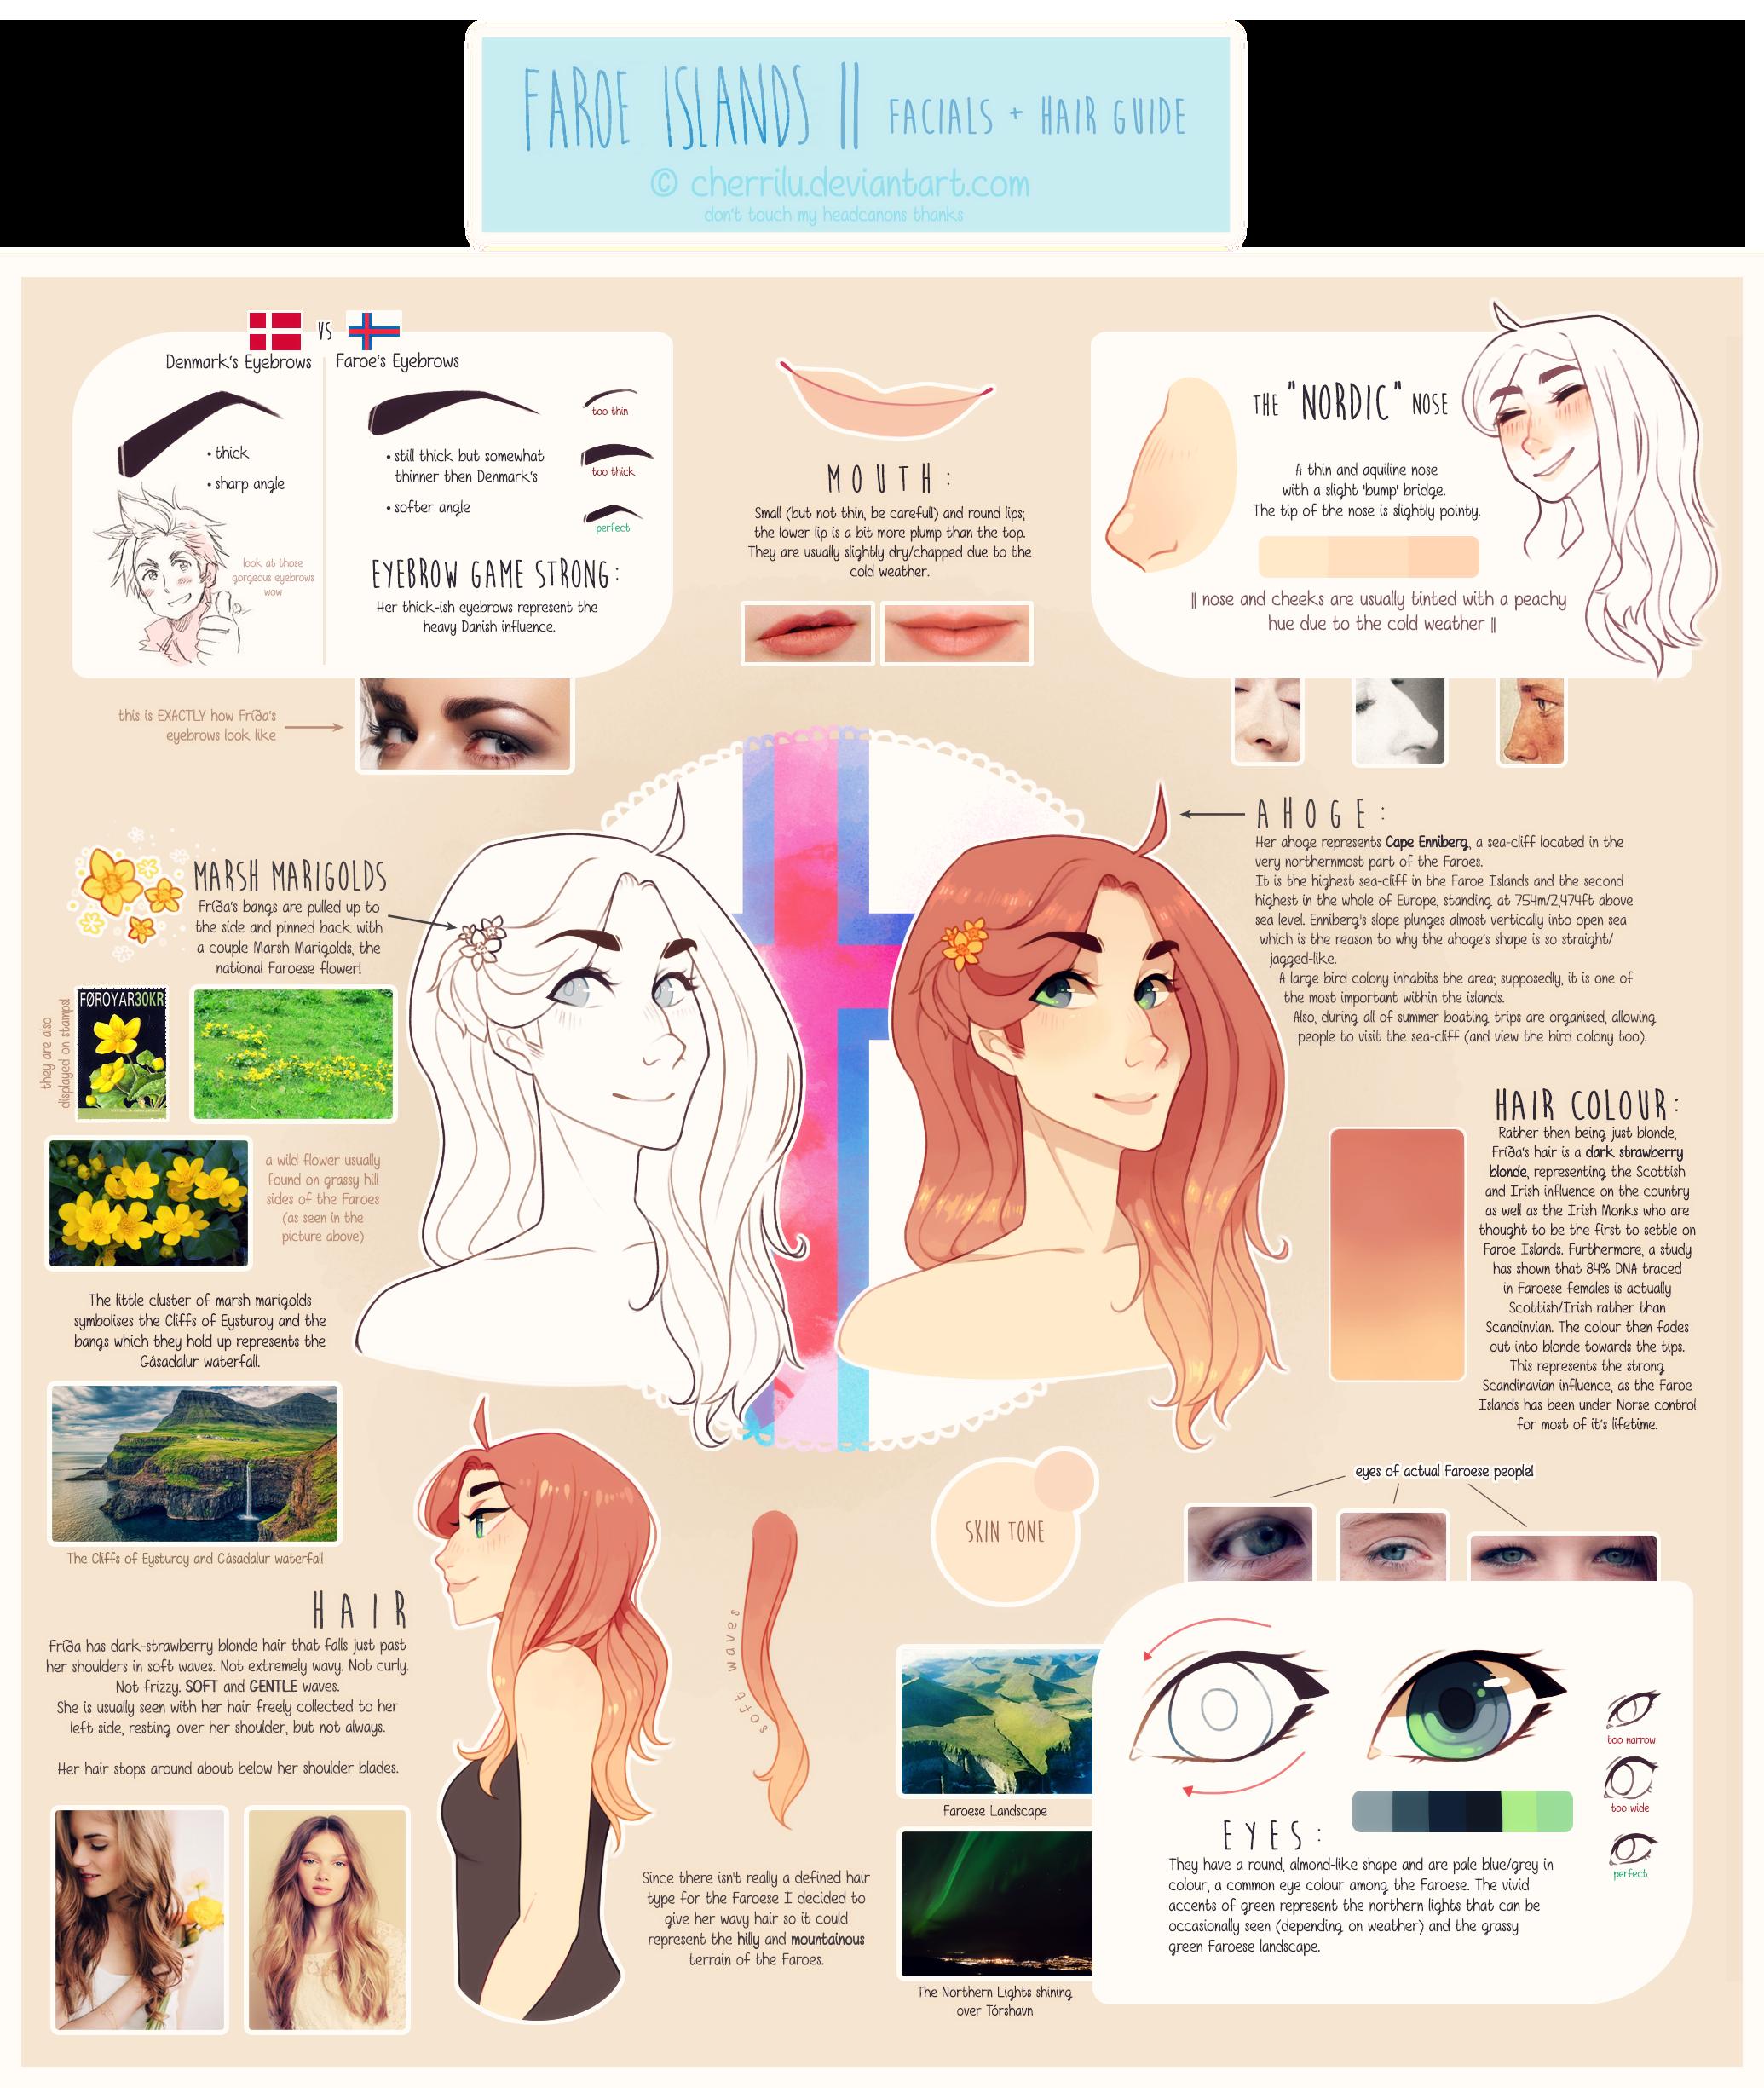 APH | Faroe Islands - Facial + Hair Guide by cherrilu